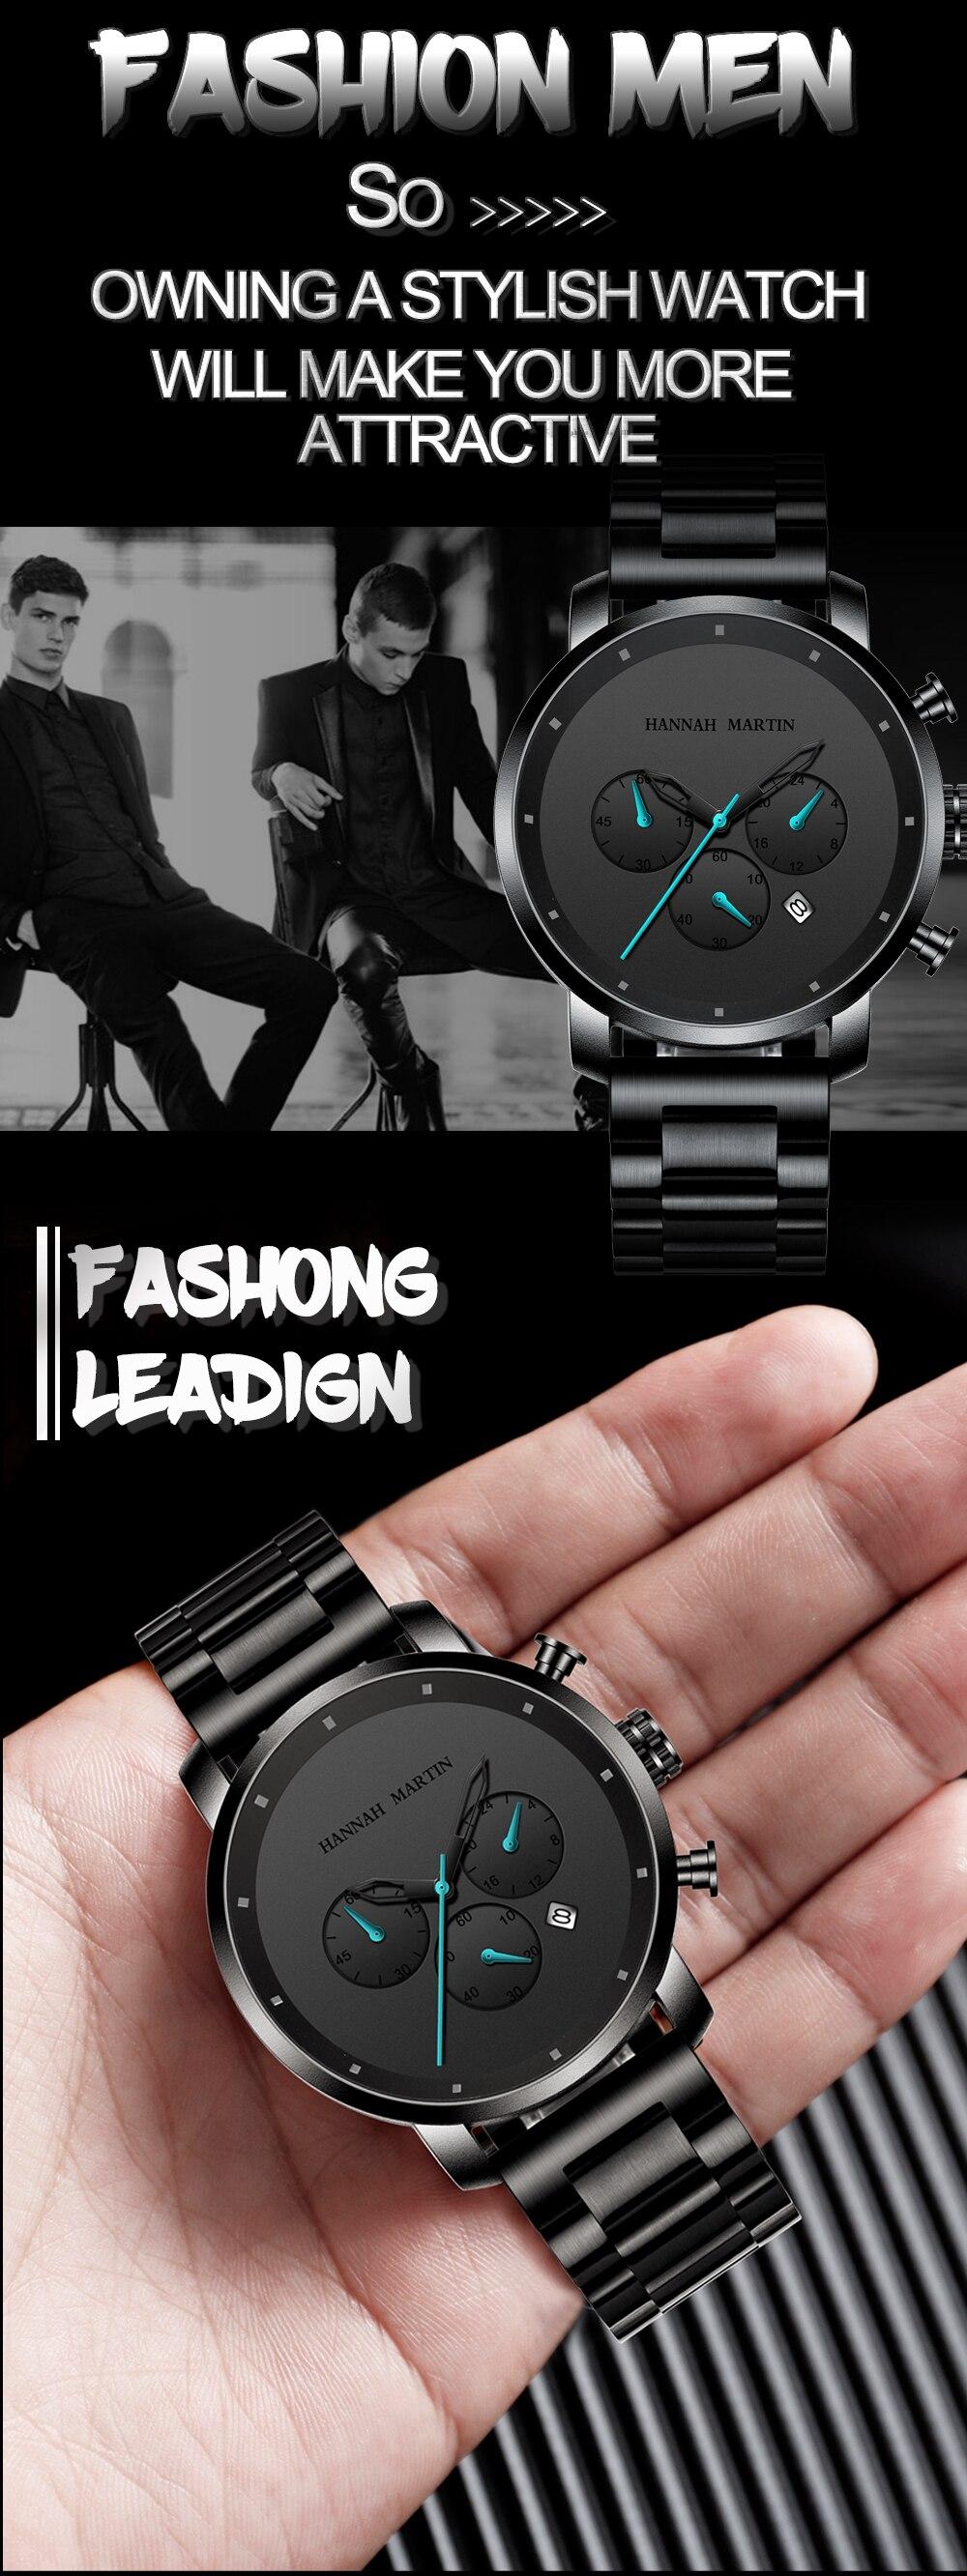 H606e2e58f9c14348ae02ac2cf67a890dk DropShipping Big Dial 45mm Full Black Stainless Steel Multi-function Calendar Men's Top Brand Luxury Watches Relogio Masculino